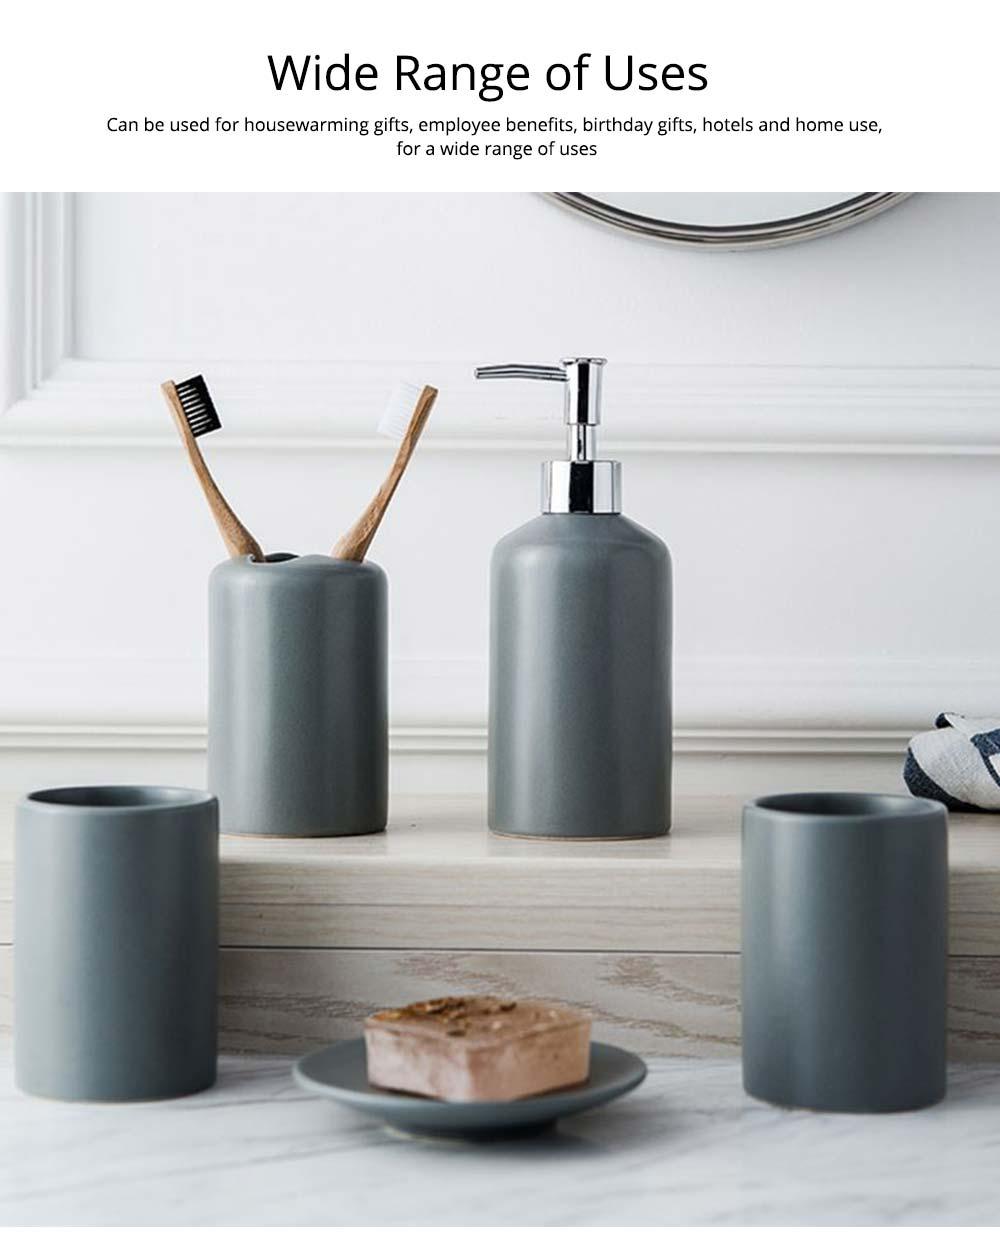 Five-piece Bathroom Set, Porcelain Bathroom Accessory Set, Bathroom Products Shower Gift Box 5